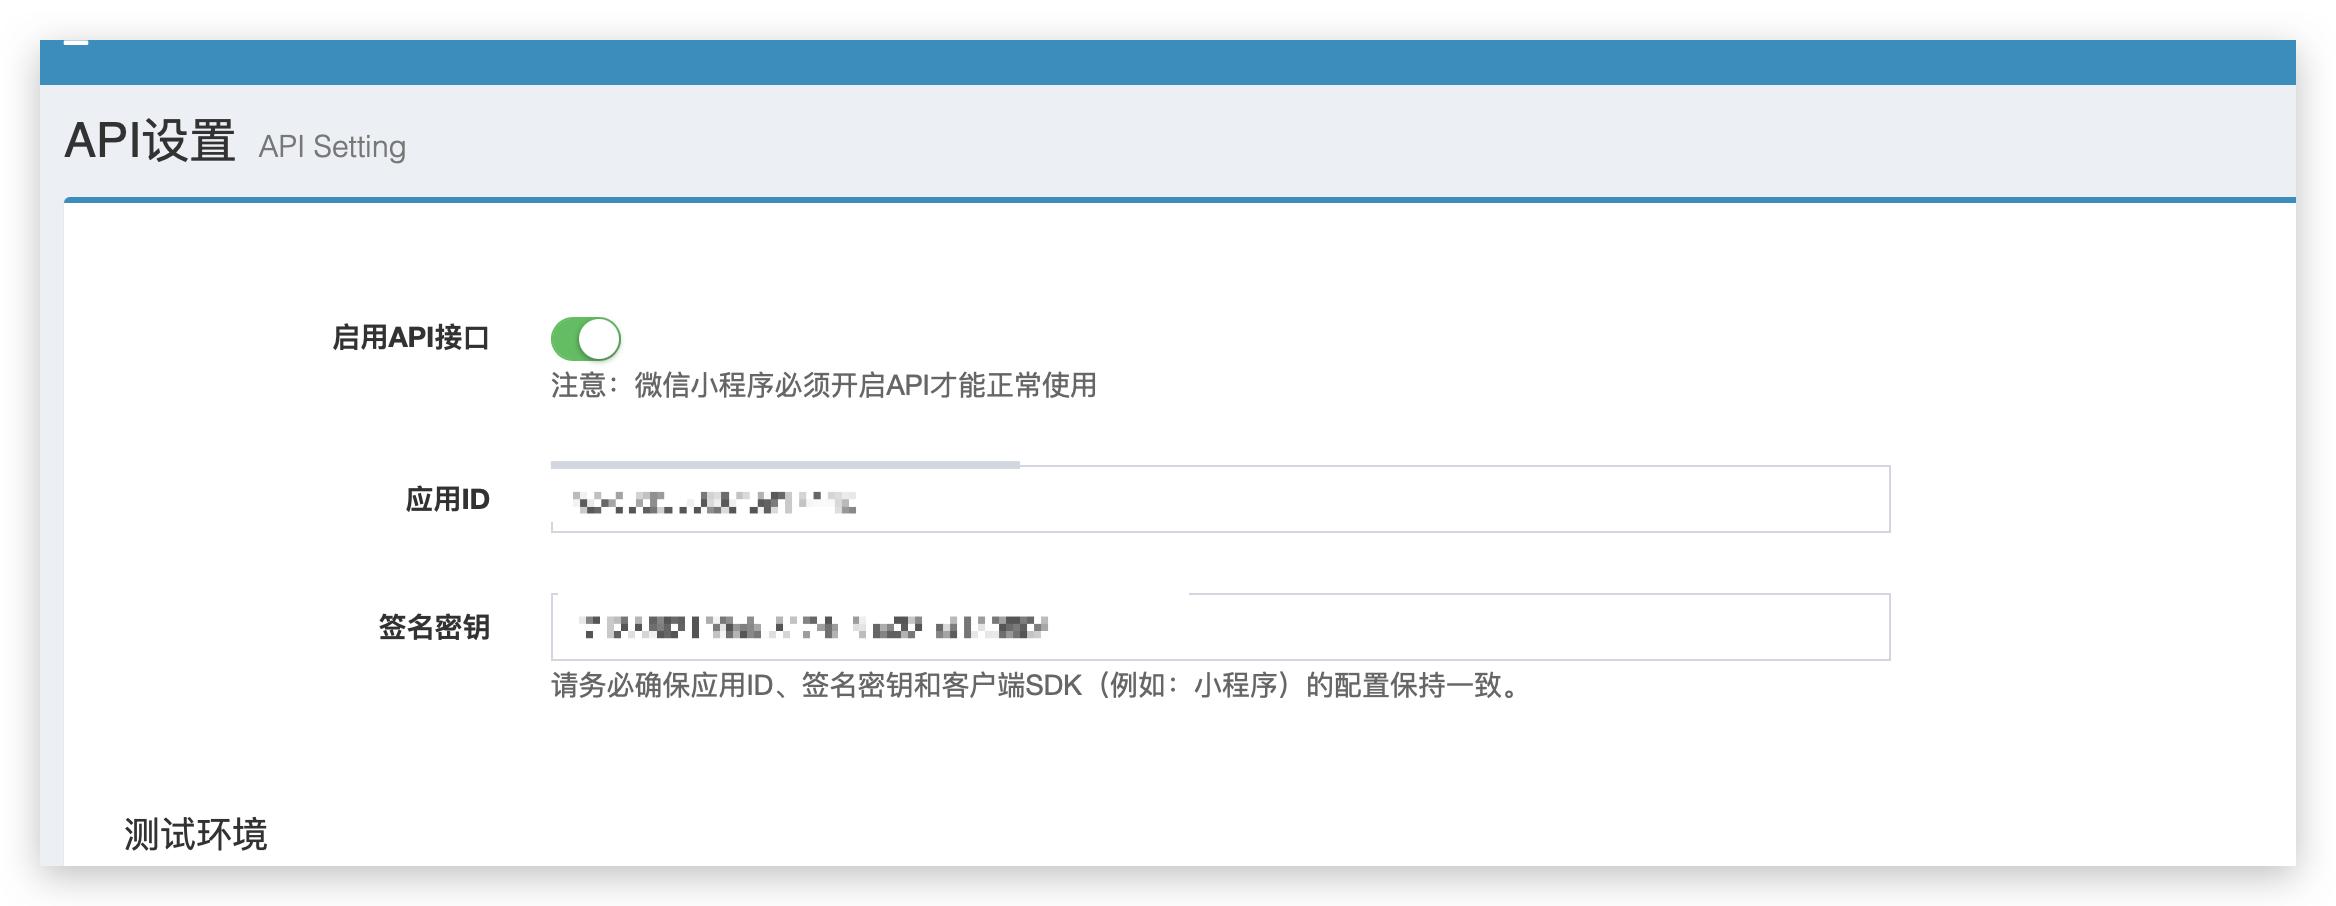 jpress api设置和调用文档